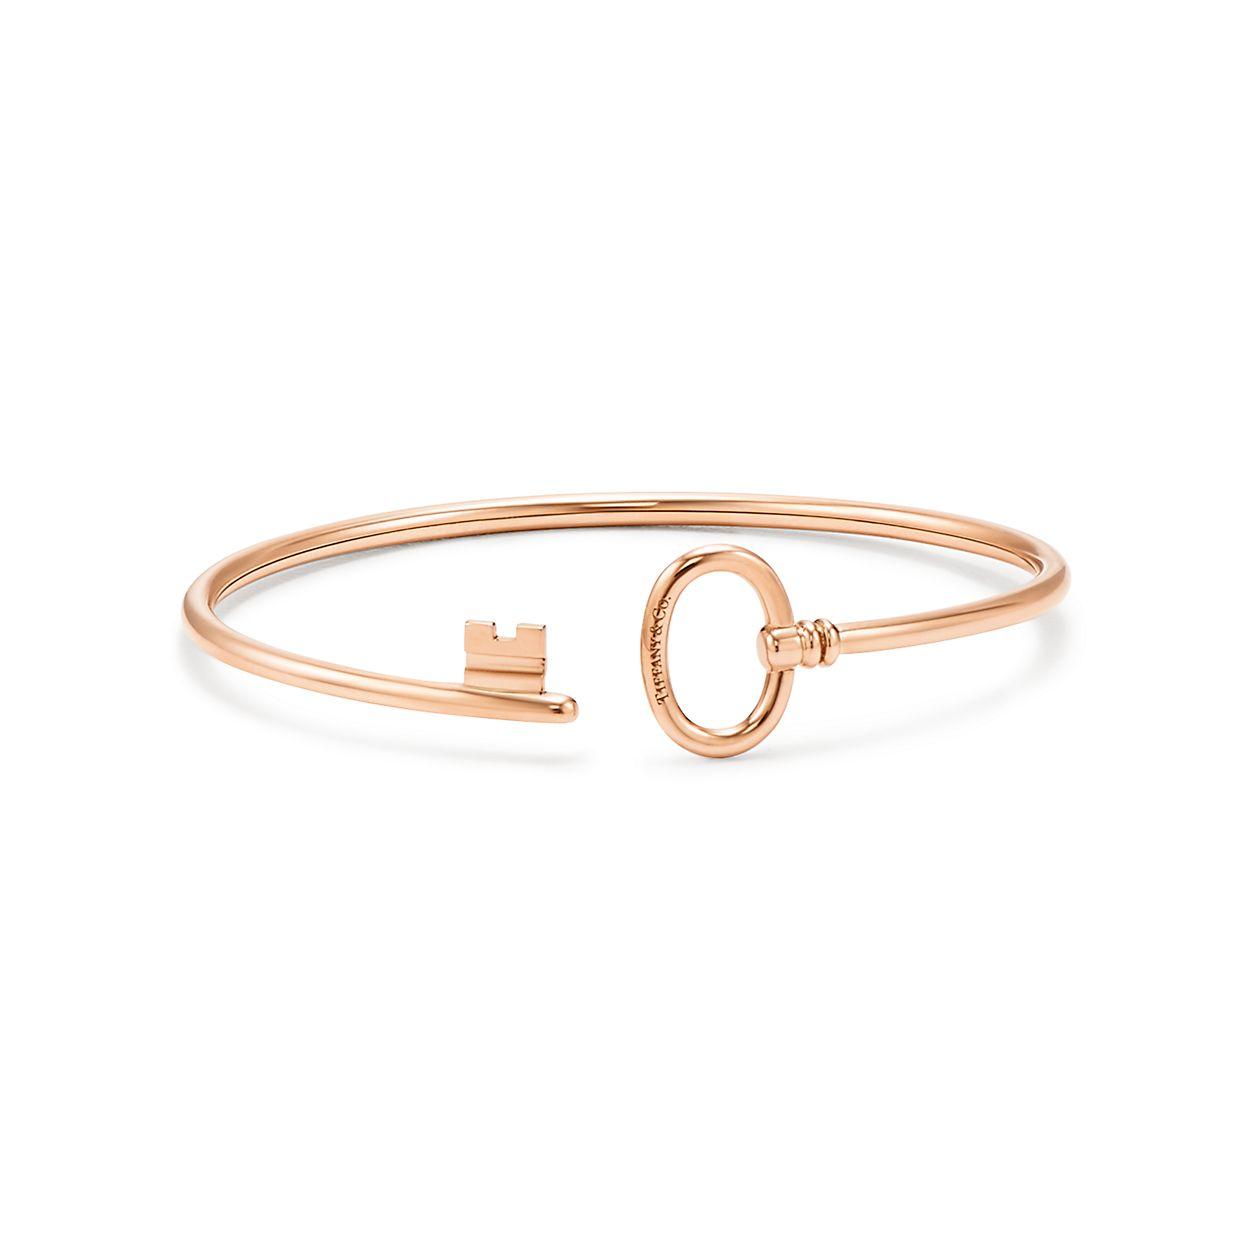 Tiffany Keys wire bracelet in 18k rose gold, medium. | Tiffany & Co.